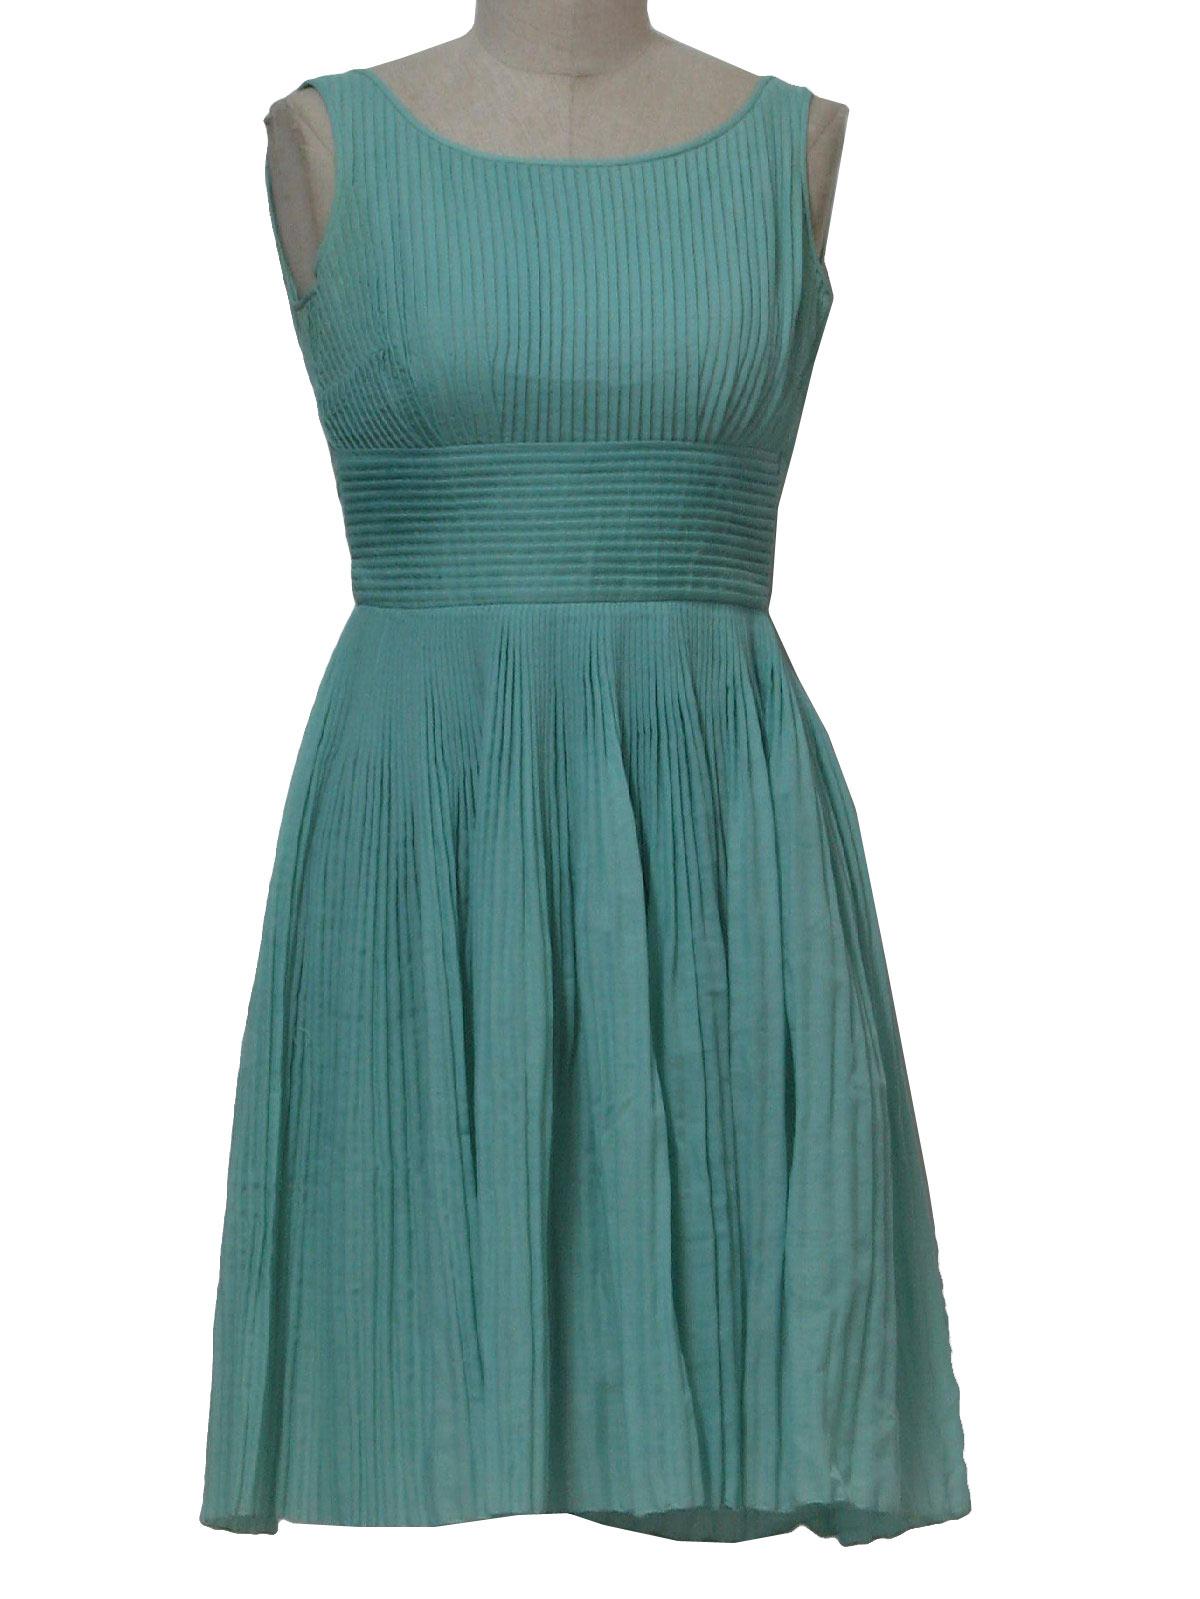 Vintage Laiglon Fifties Dress: 50s -Laiglon- Womens light blue mid ...